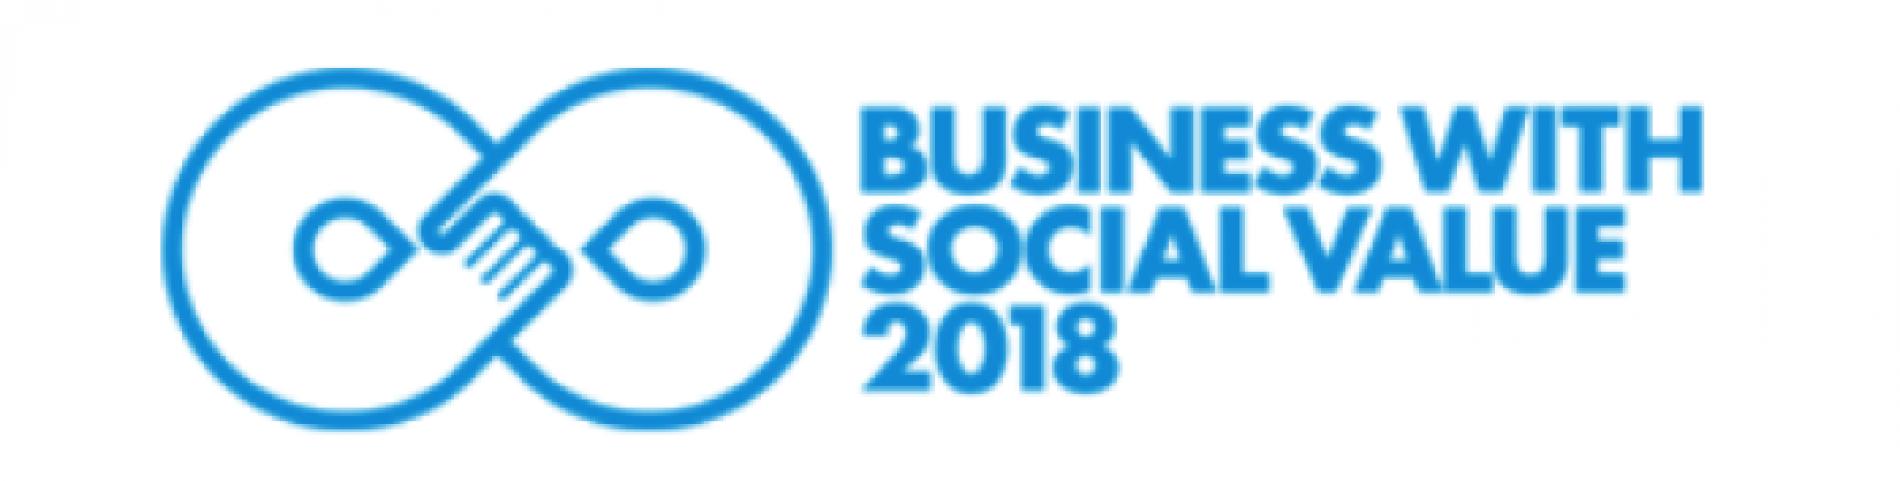 Torna el Business With Social Value